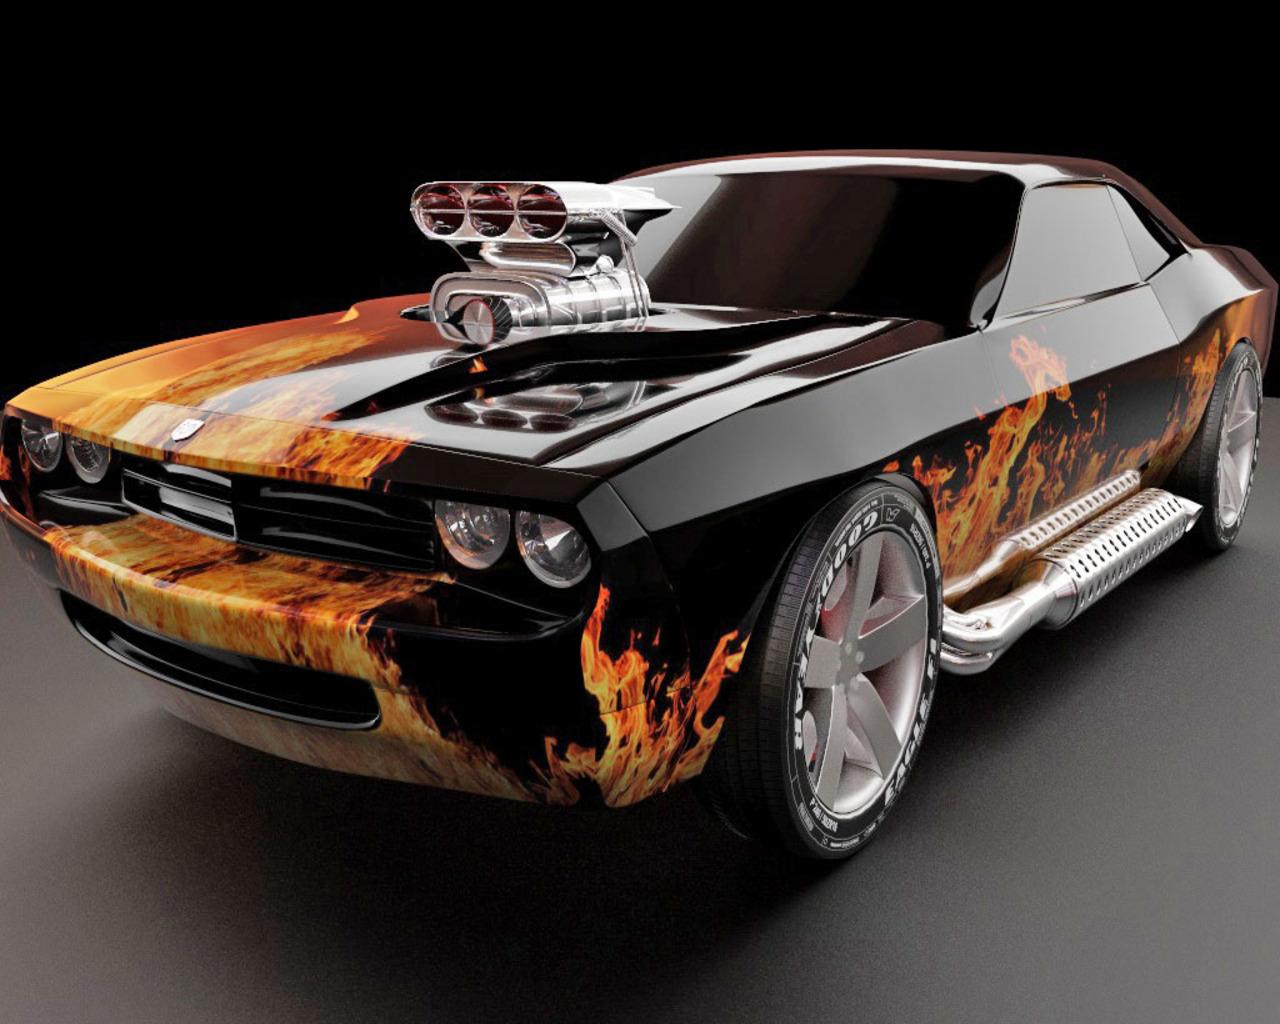 Description Dodge Challenger Wallpaper is Wallapers for pc desktop 1280x1024